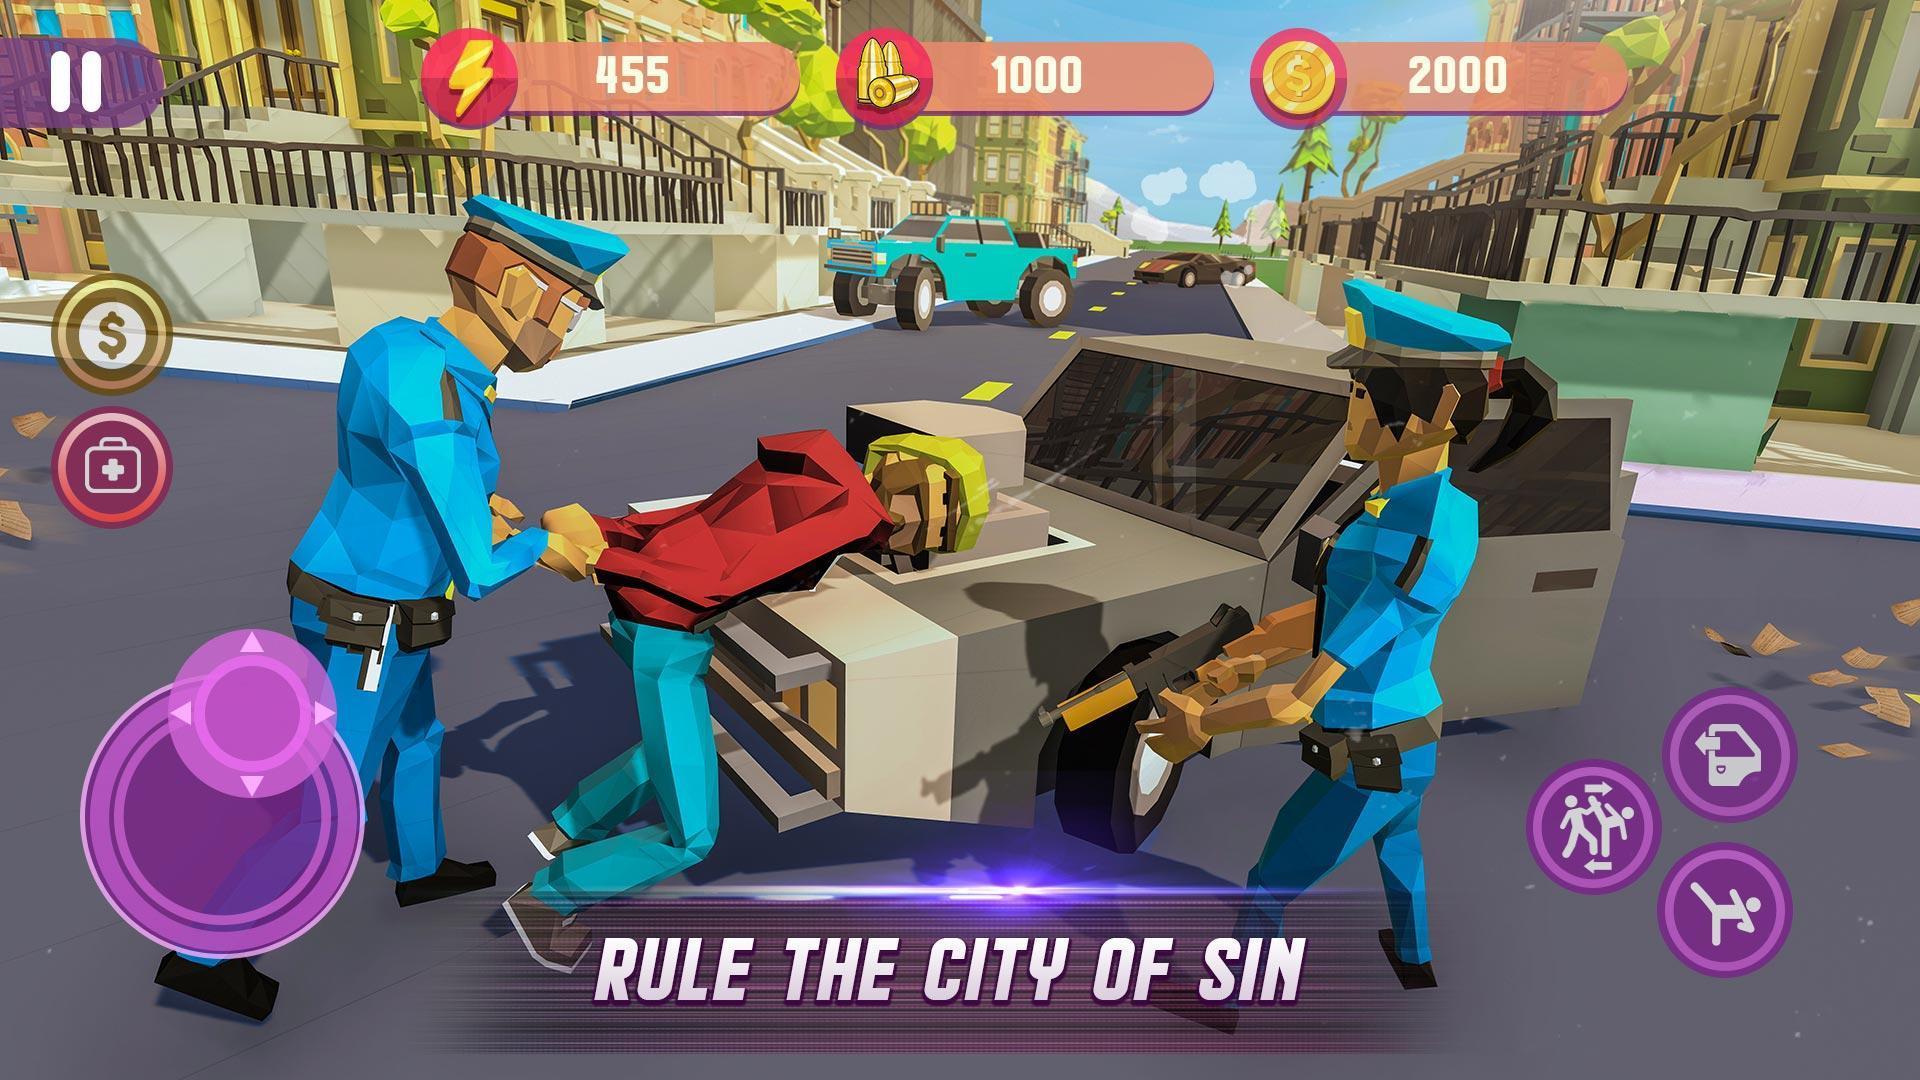 Dude Theft Crime Mafia Gangster Mod Apk